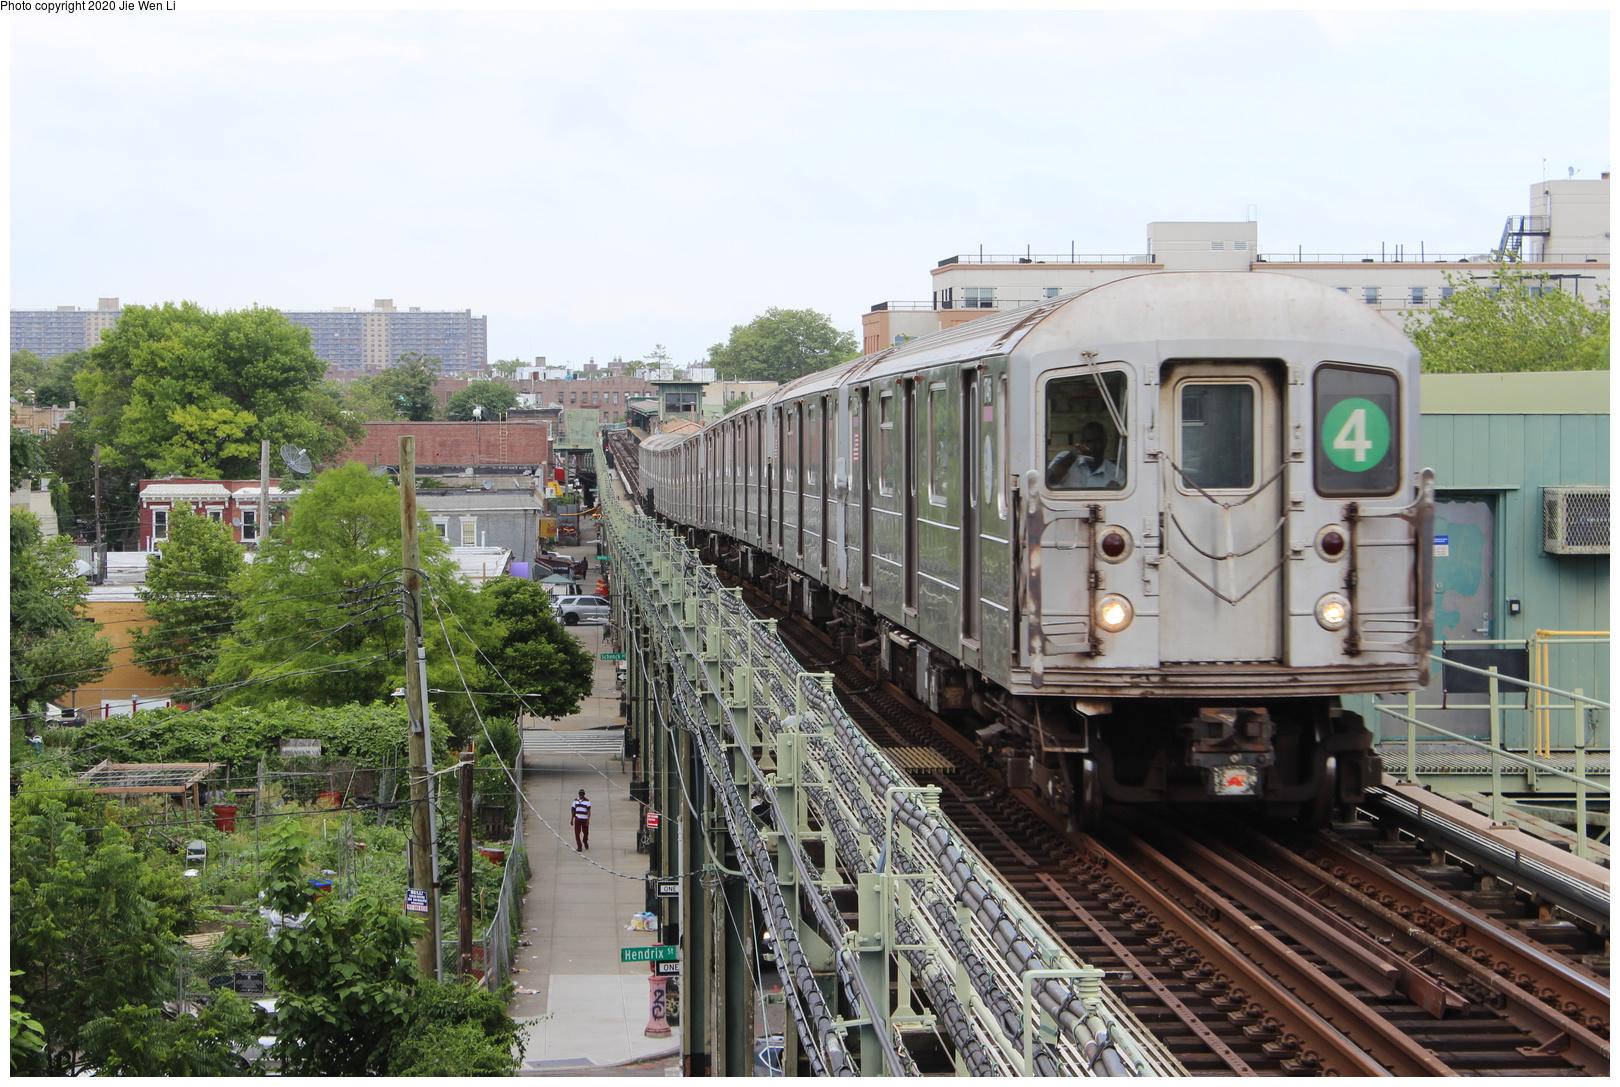 (267k, 1044x726)<br><b>Country:</b> United States<br><b>City:</b> New York<br><b>System:</b> New York City Transit<br><b>Line:</b> BMT Myrtle Avenue Line<br><b>Location:</b> Metropolitan Avenue <br><b>Car:</b> BMT Multi  <br><b>Photo by:</b> Joel Shanus<br><b>Viewed (this week/total):</b> 3 / 2765